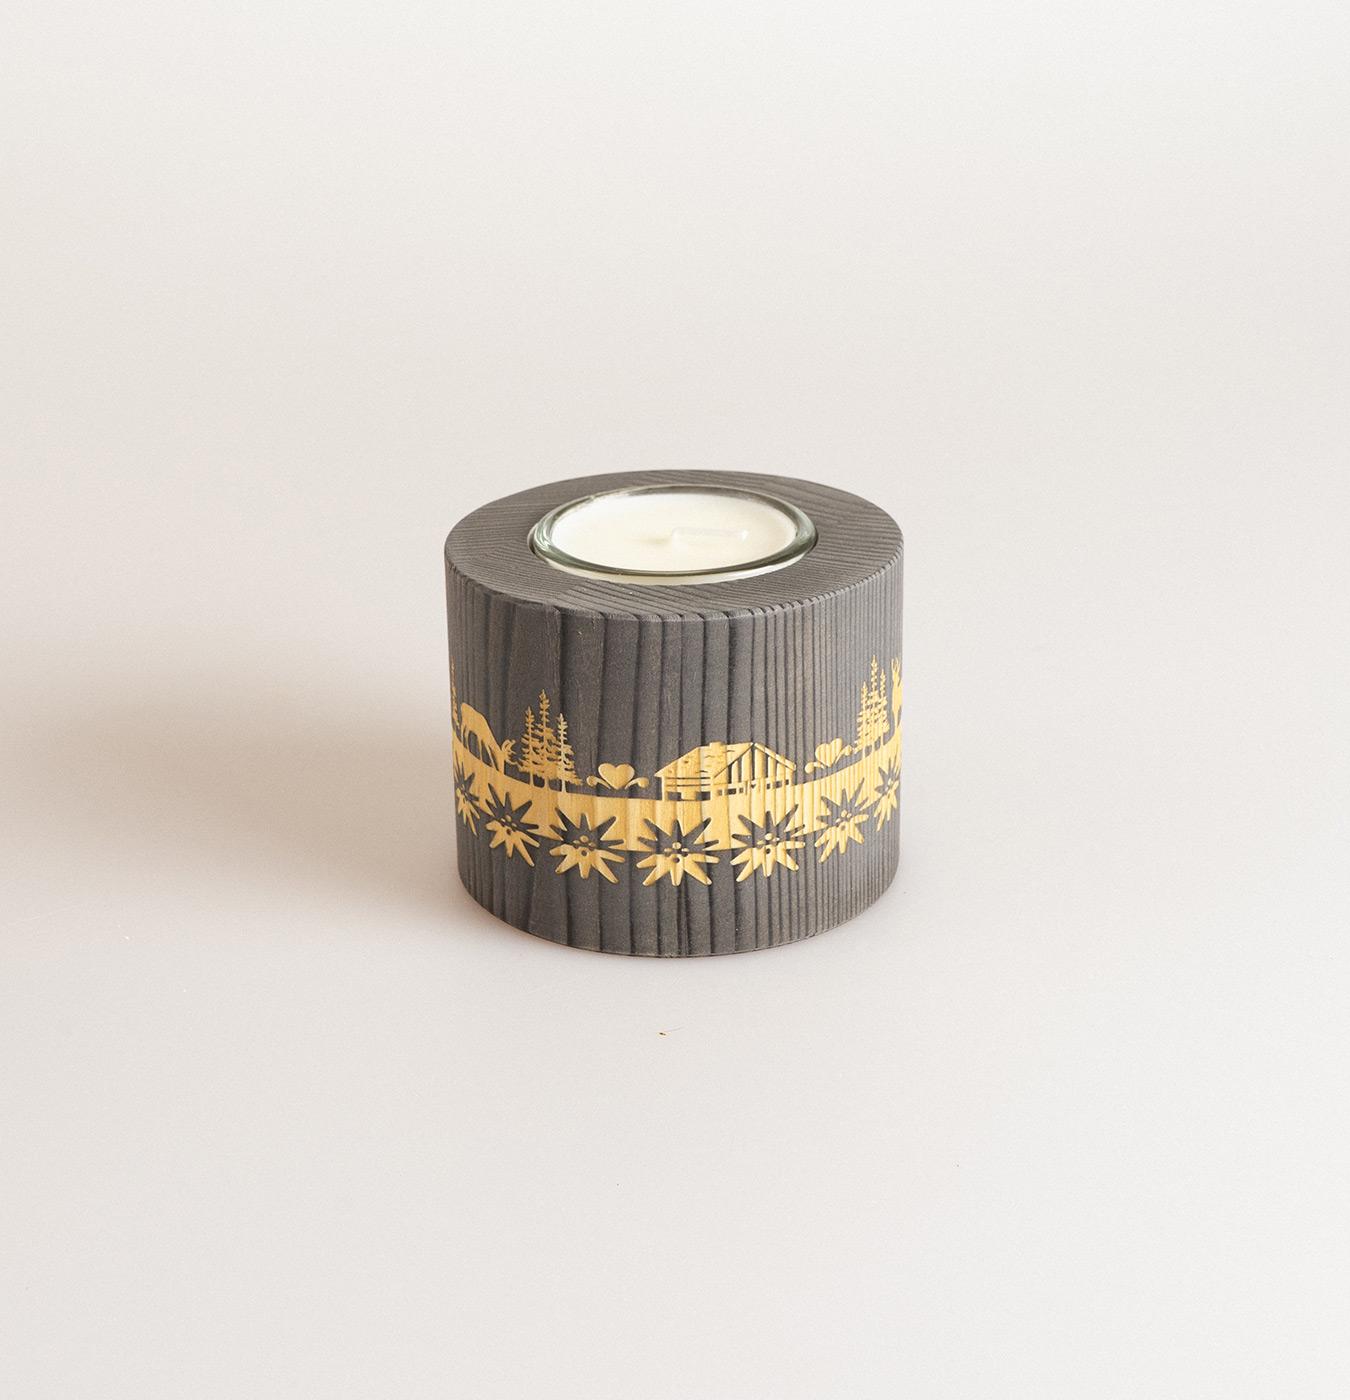 Portacandela tondo in legno di abete con candelina.